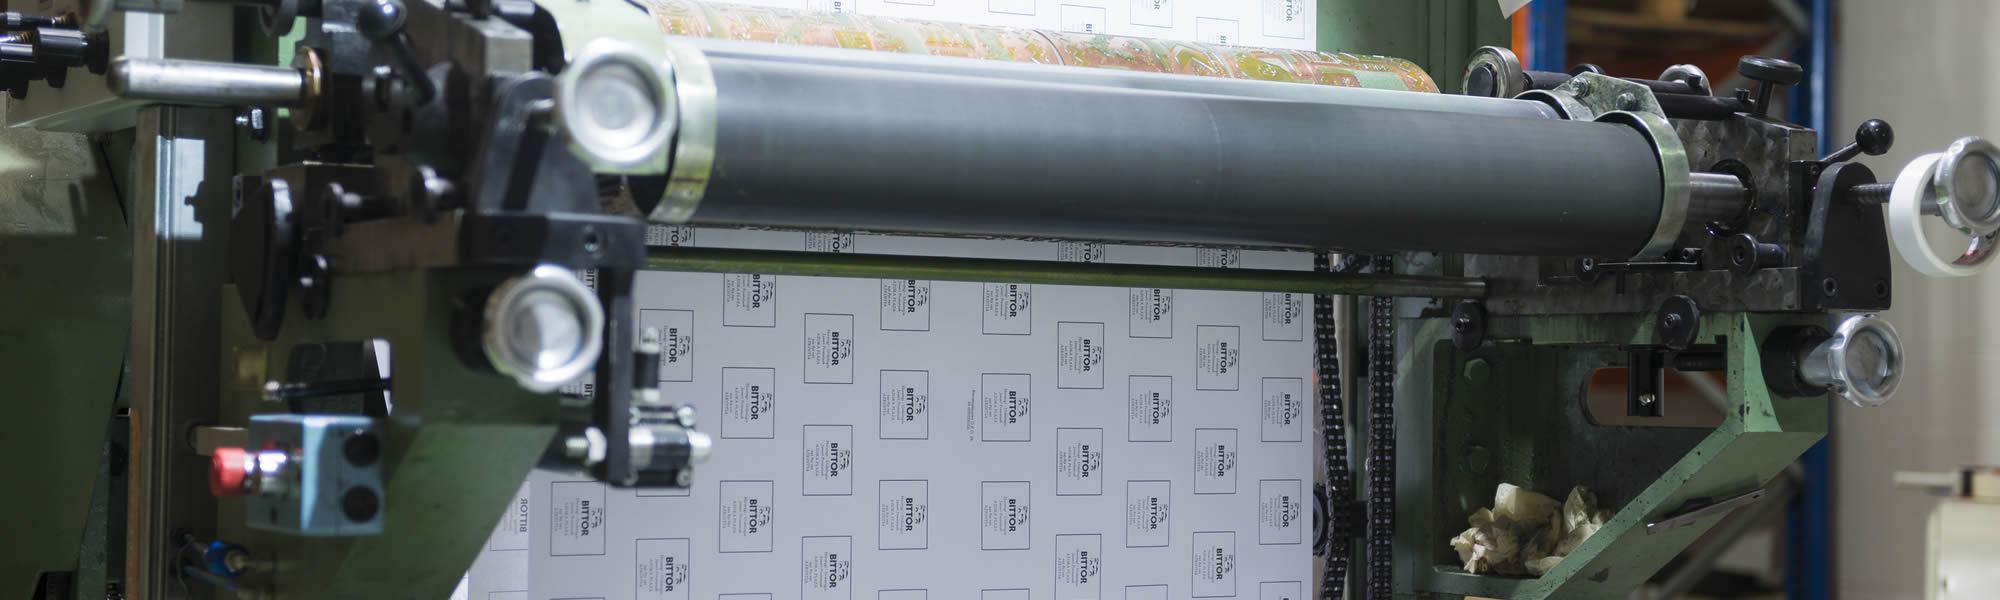 Zubelzu fabrica material de embalaje y productos de packaging